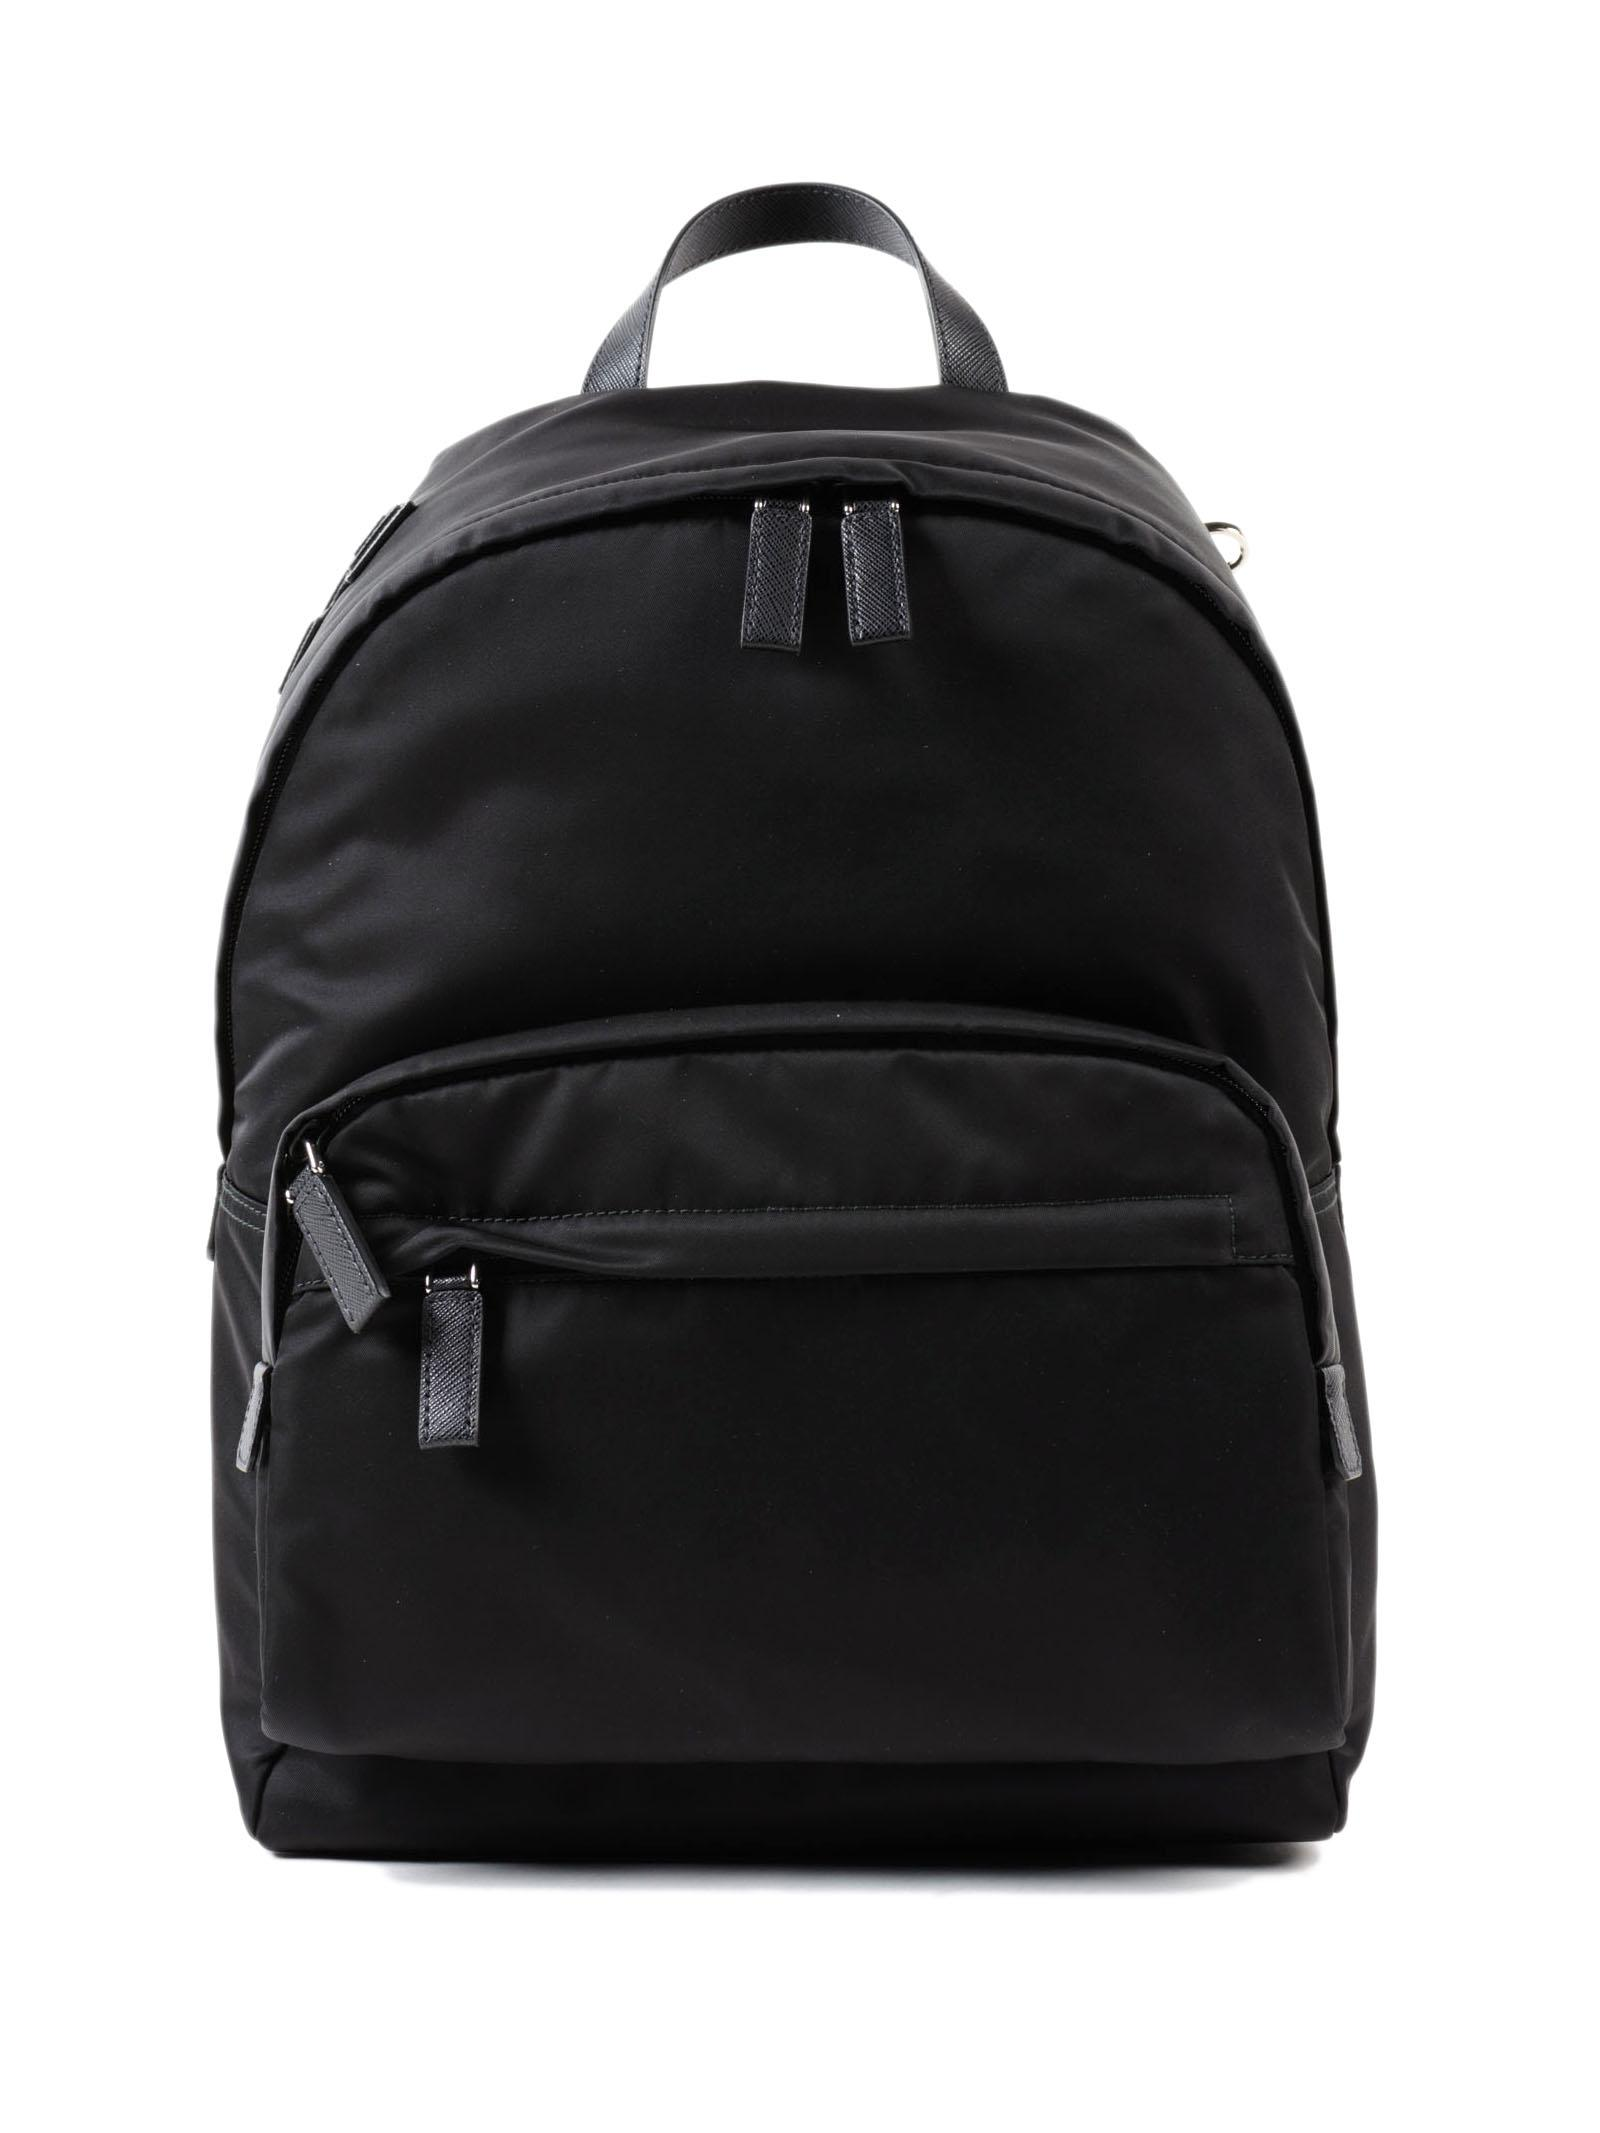 a0c3784402d8 Lyst - Prada Backpack Tessuto Montagna in Black for Men - Save 35%